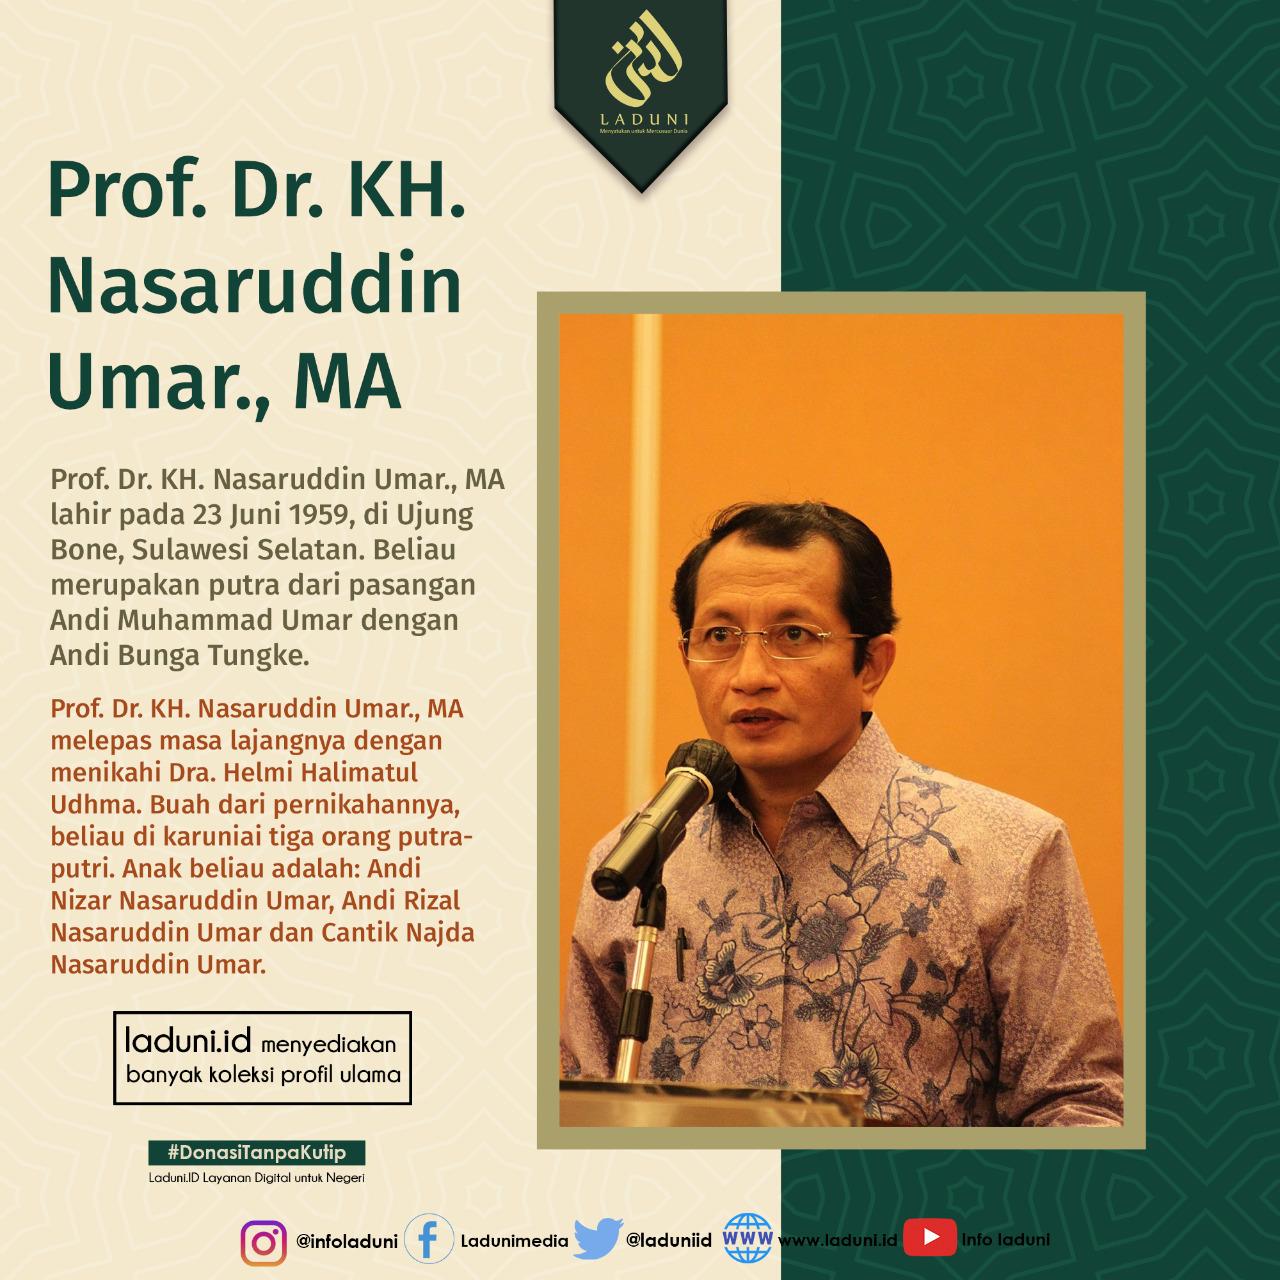 Biografi Prof. Dr. KH. Nasaruddin Umar., MA